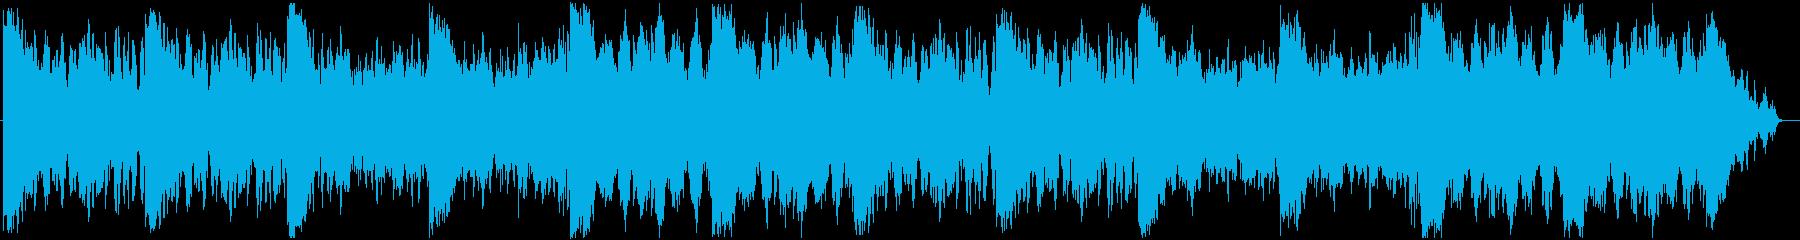 Disturbing cinematic horror background music's reproduced waveform